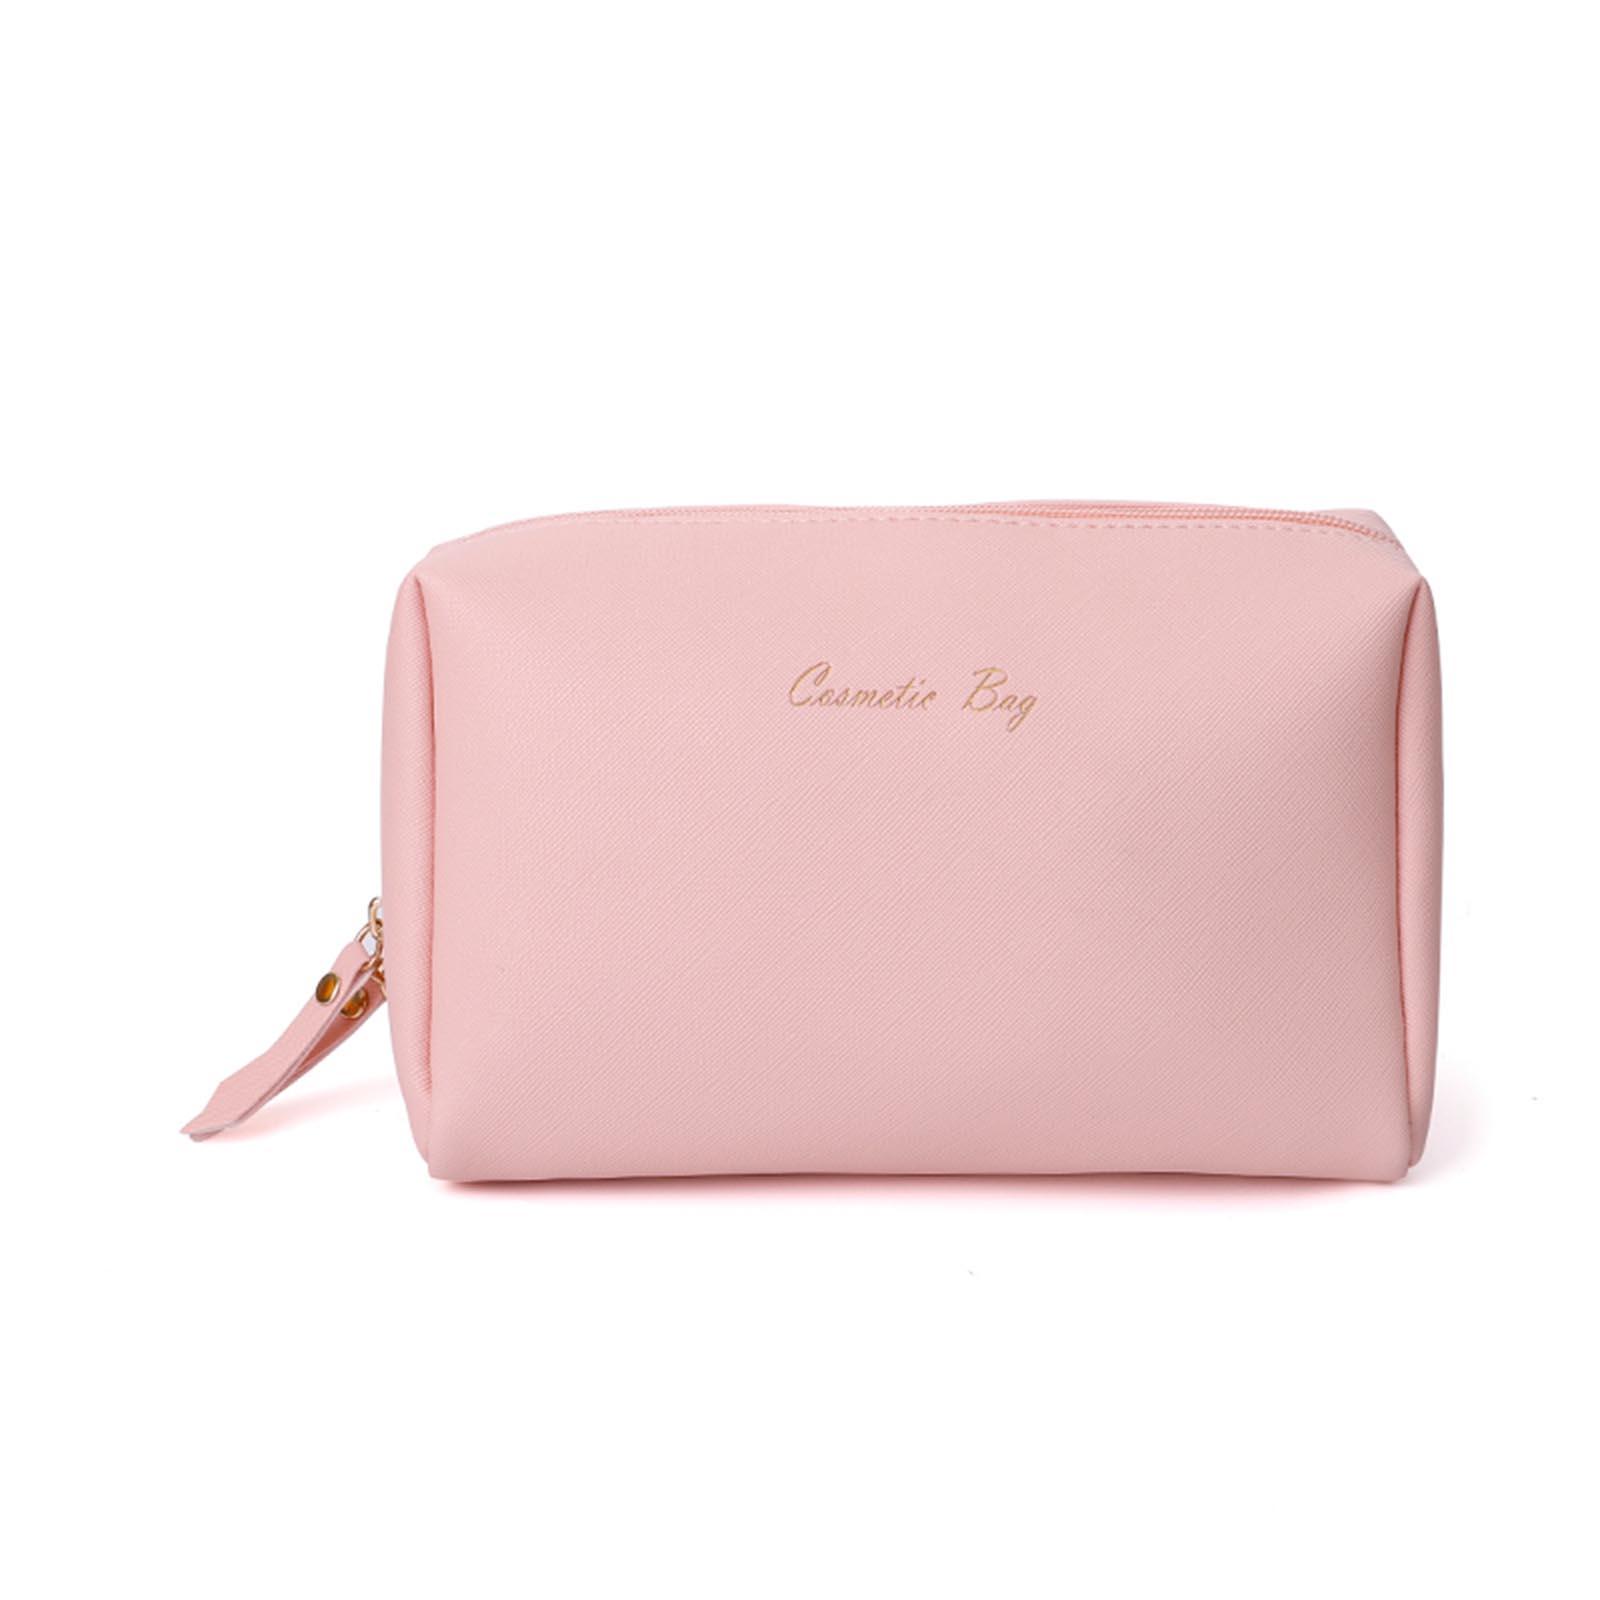 Bags For Women 2021 New Luxury Handbags Waterproof Make Up Bag Multi-Pocket Box Travel Large Capacit